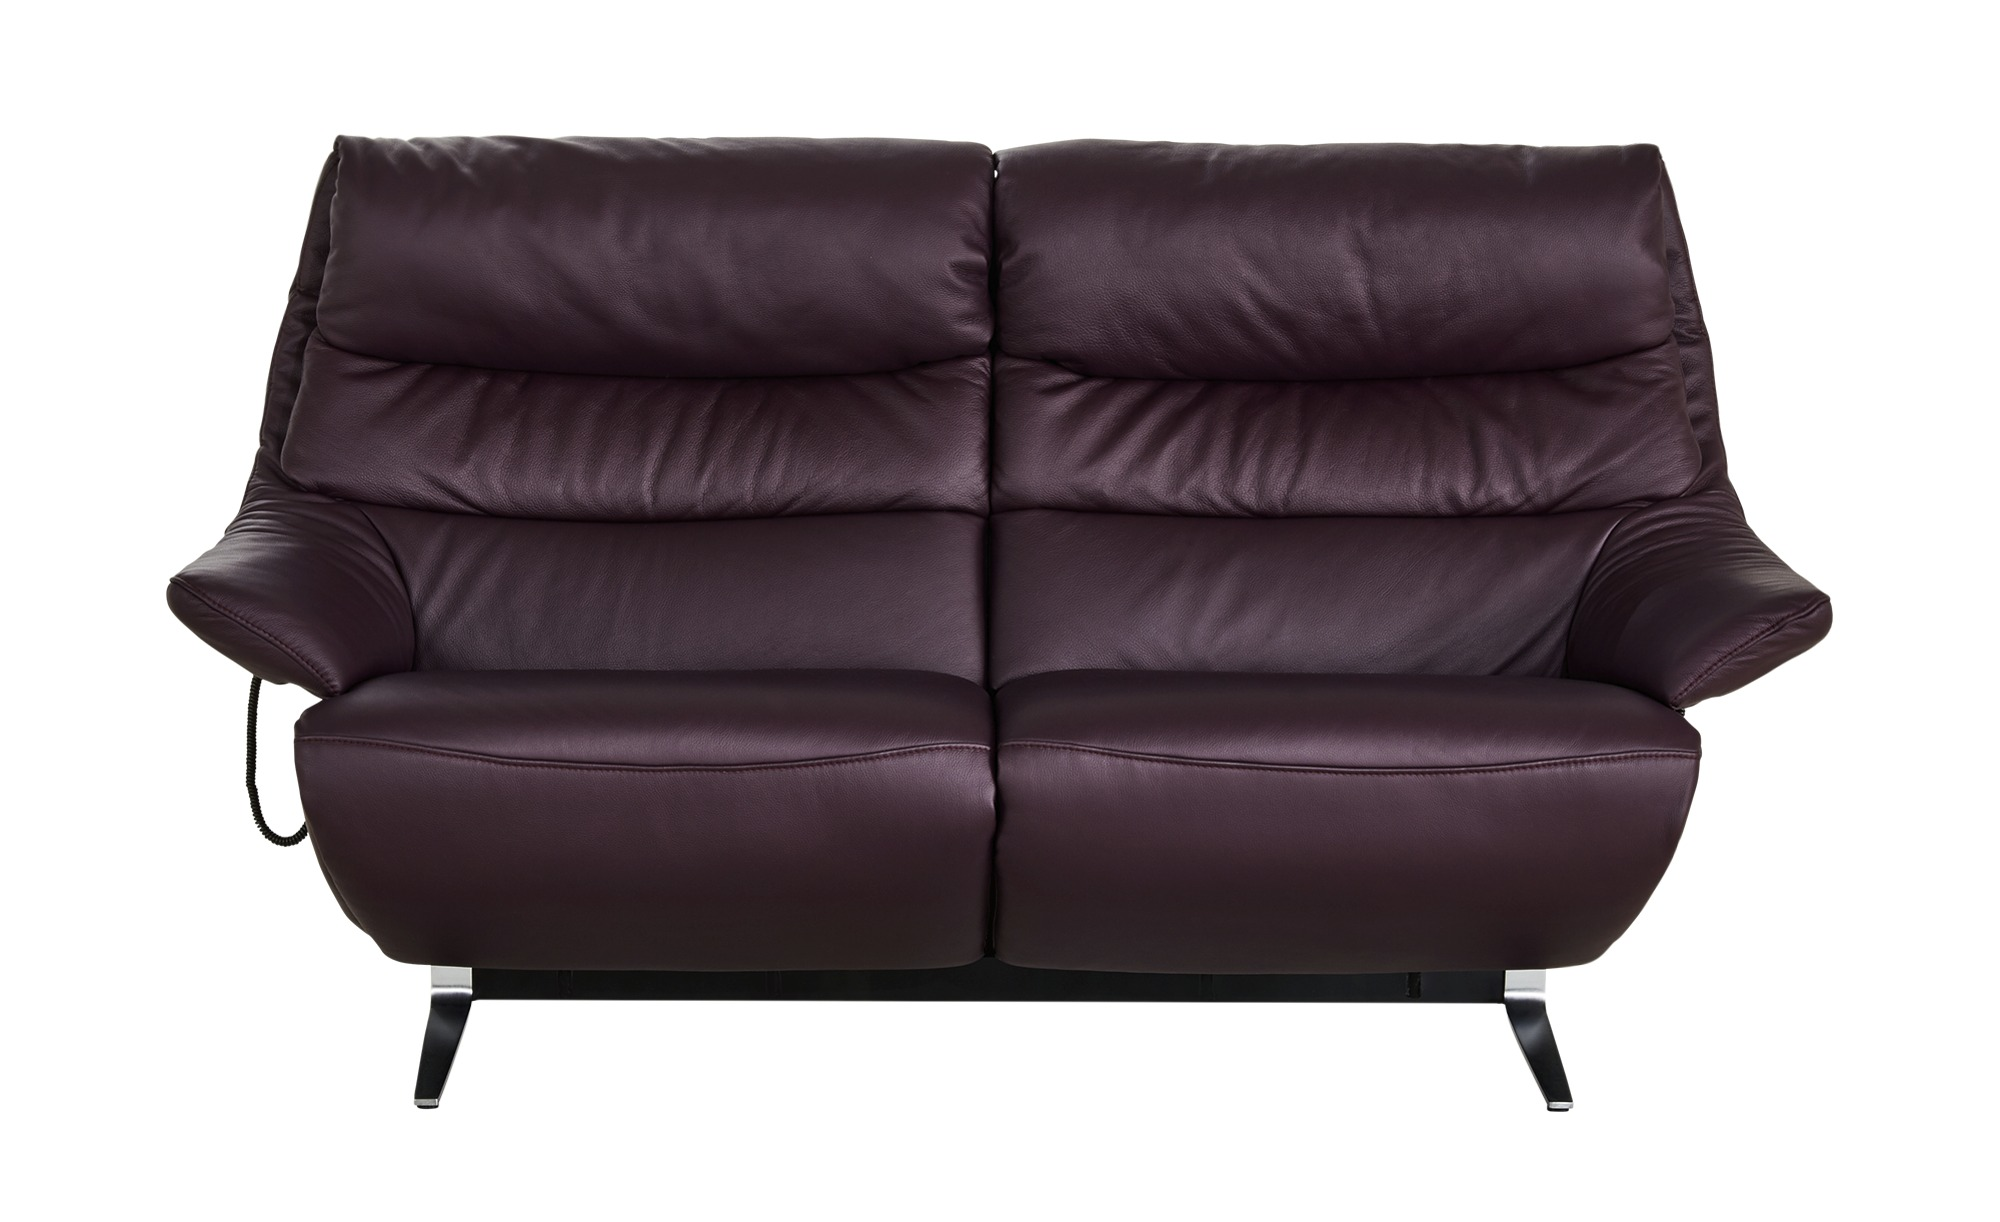 himolla Ledersofa 2,5-sitzig  Salloa ¦ lila/violett ¦ Maße (cm): B: 189 H: 107 T: 92 Polstermöbel > Sofas > Einzelsofas - Höffner